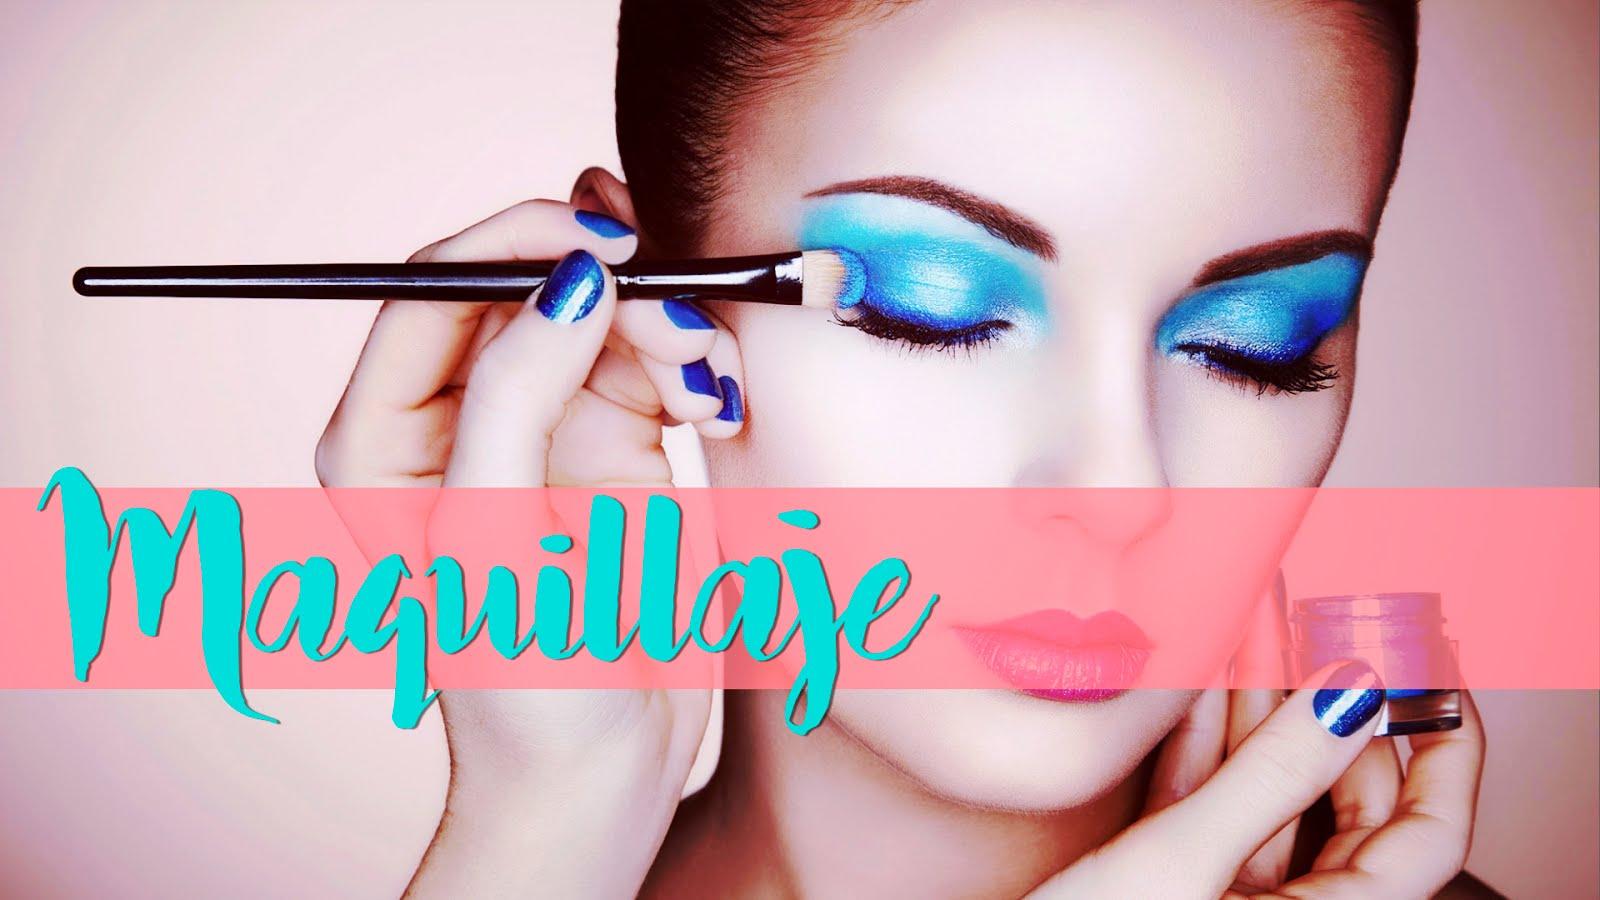 http://bridacoelho.blogspot.com.es/p/maquillaje.html